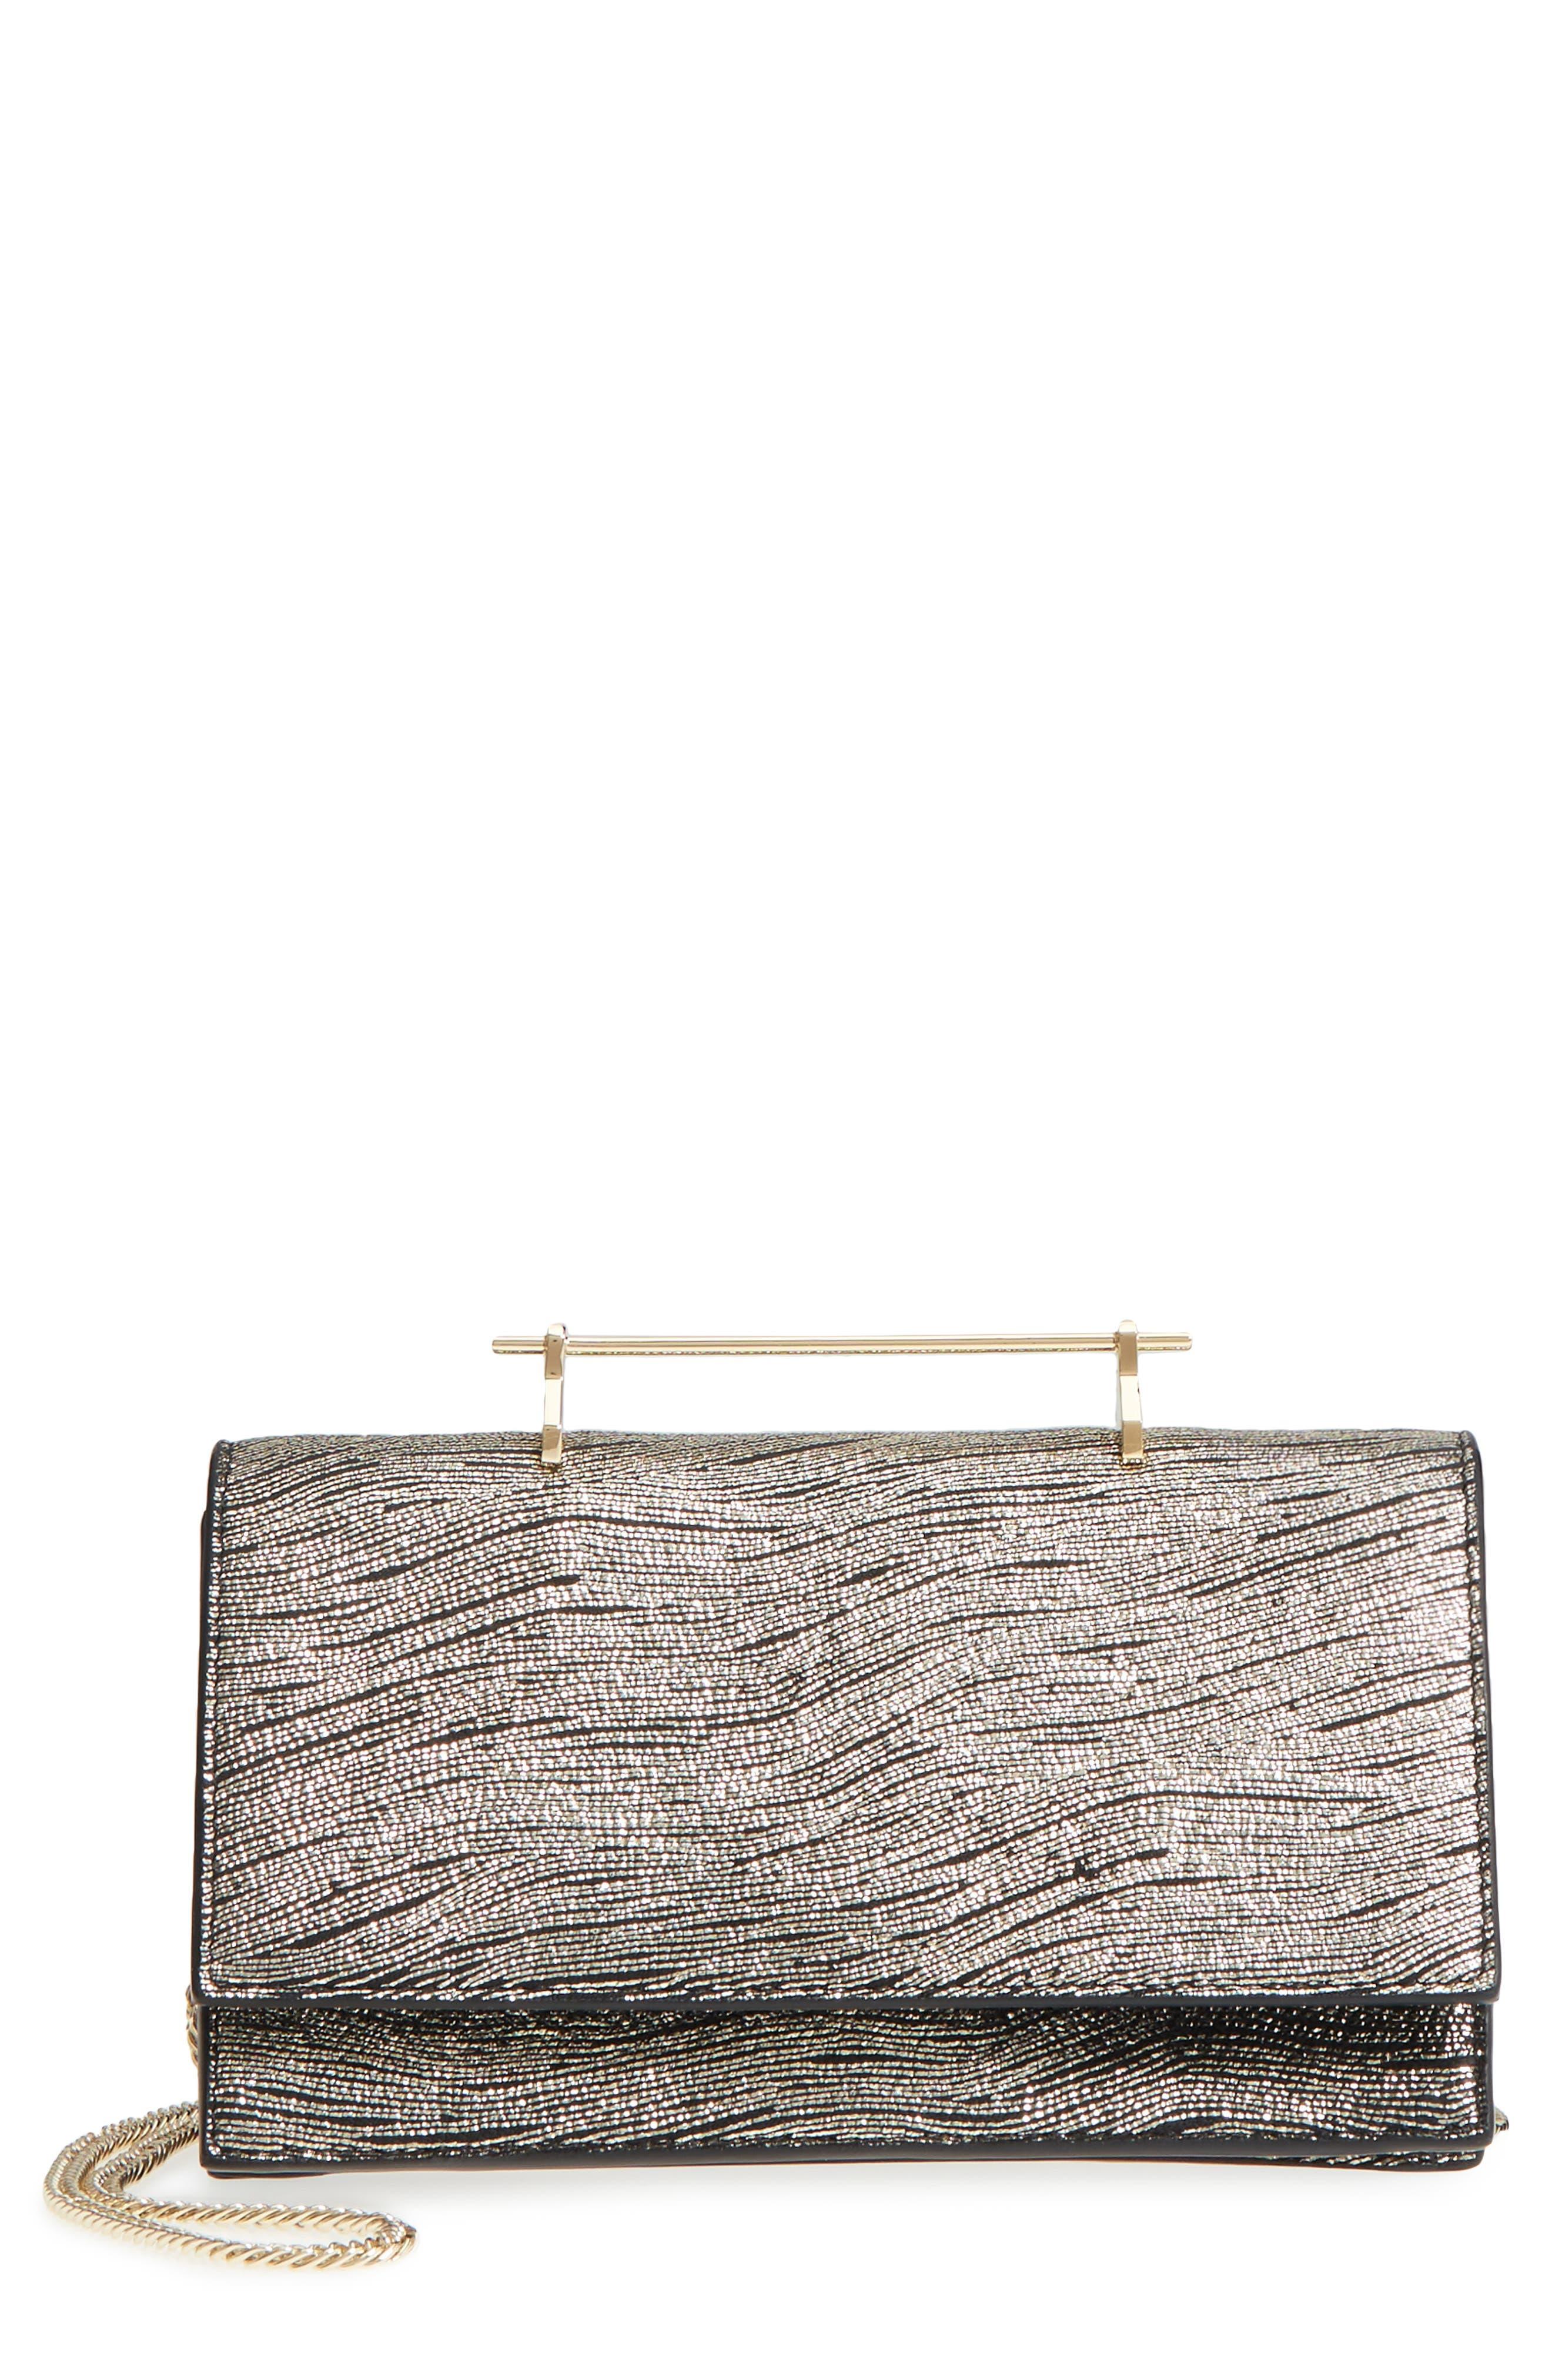 Alternate Image 1 Selected - M2Malletier Alexia Metallic Calfskin Leather Clutch